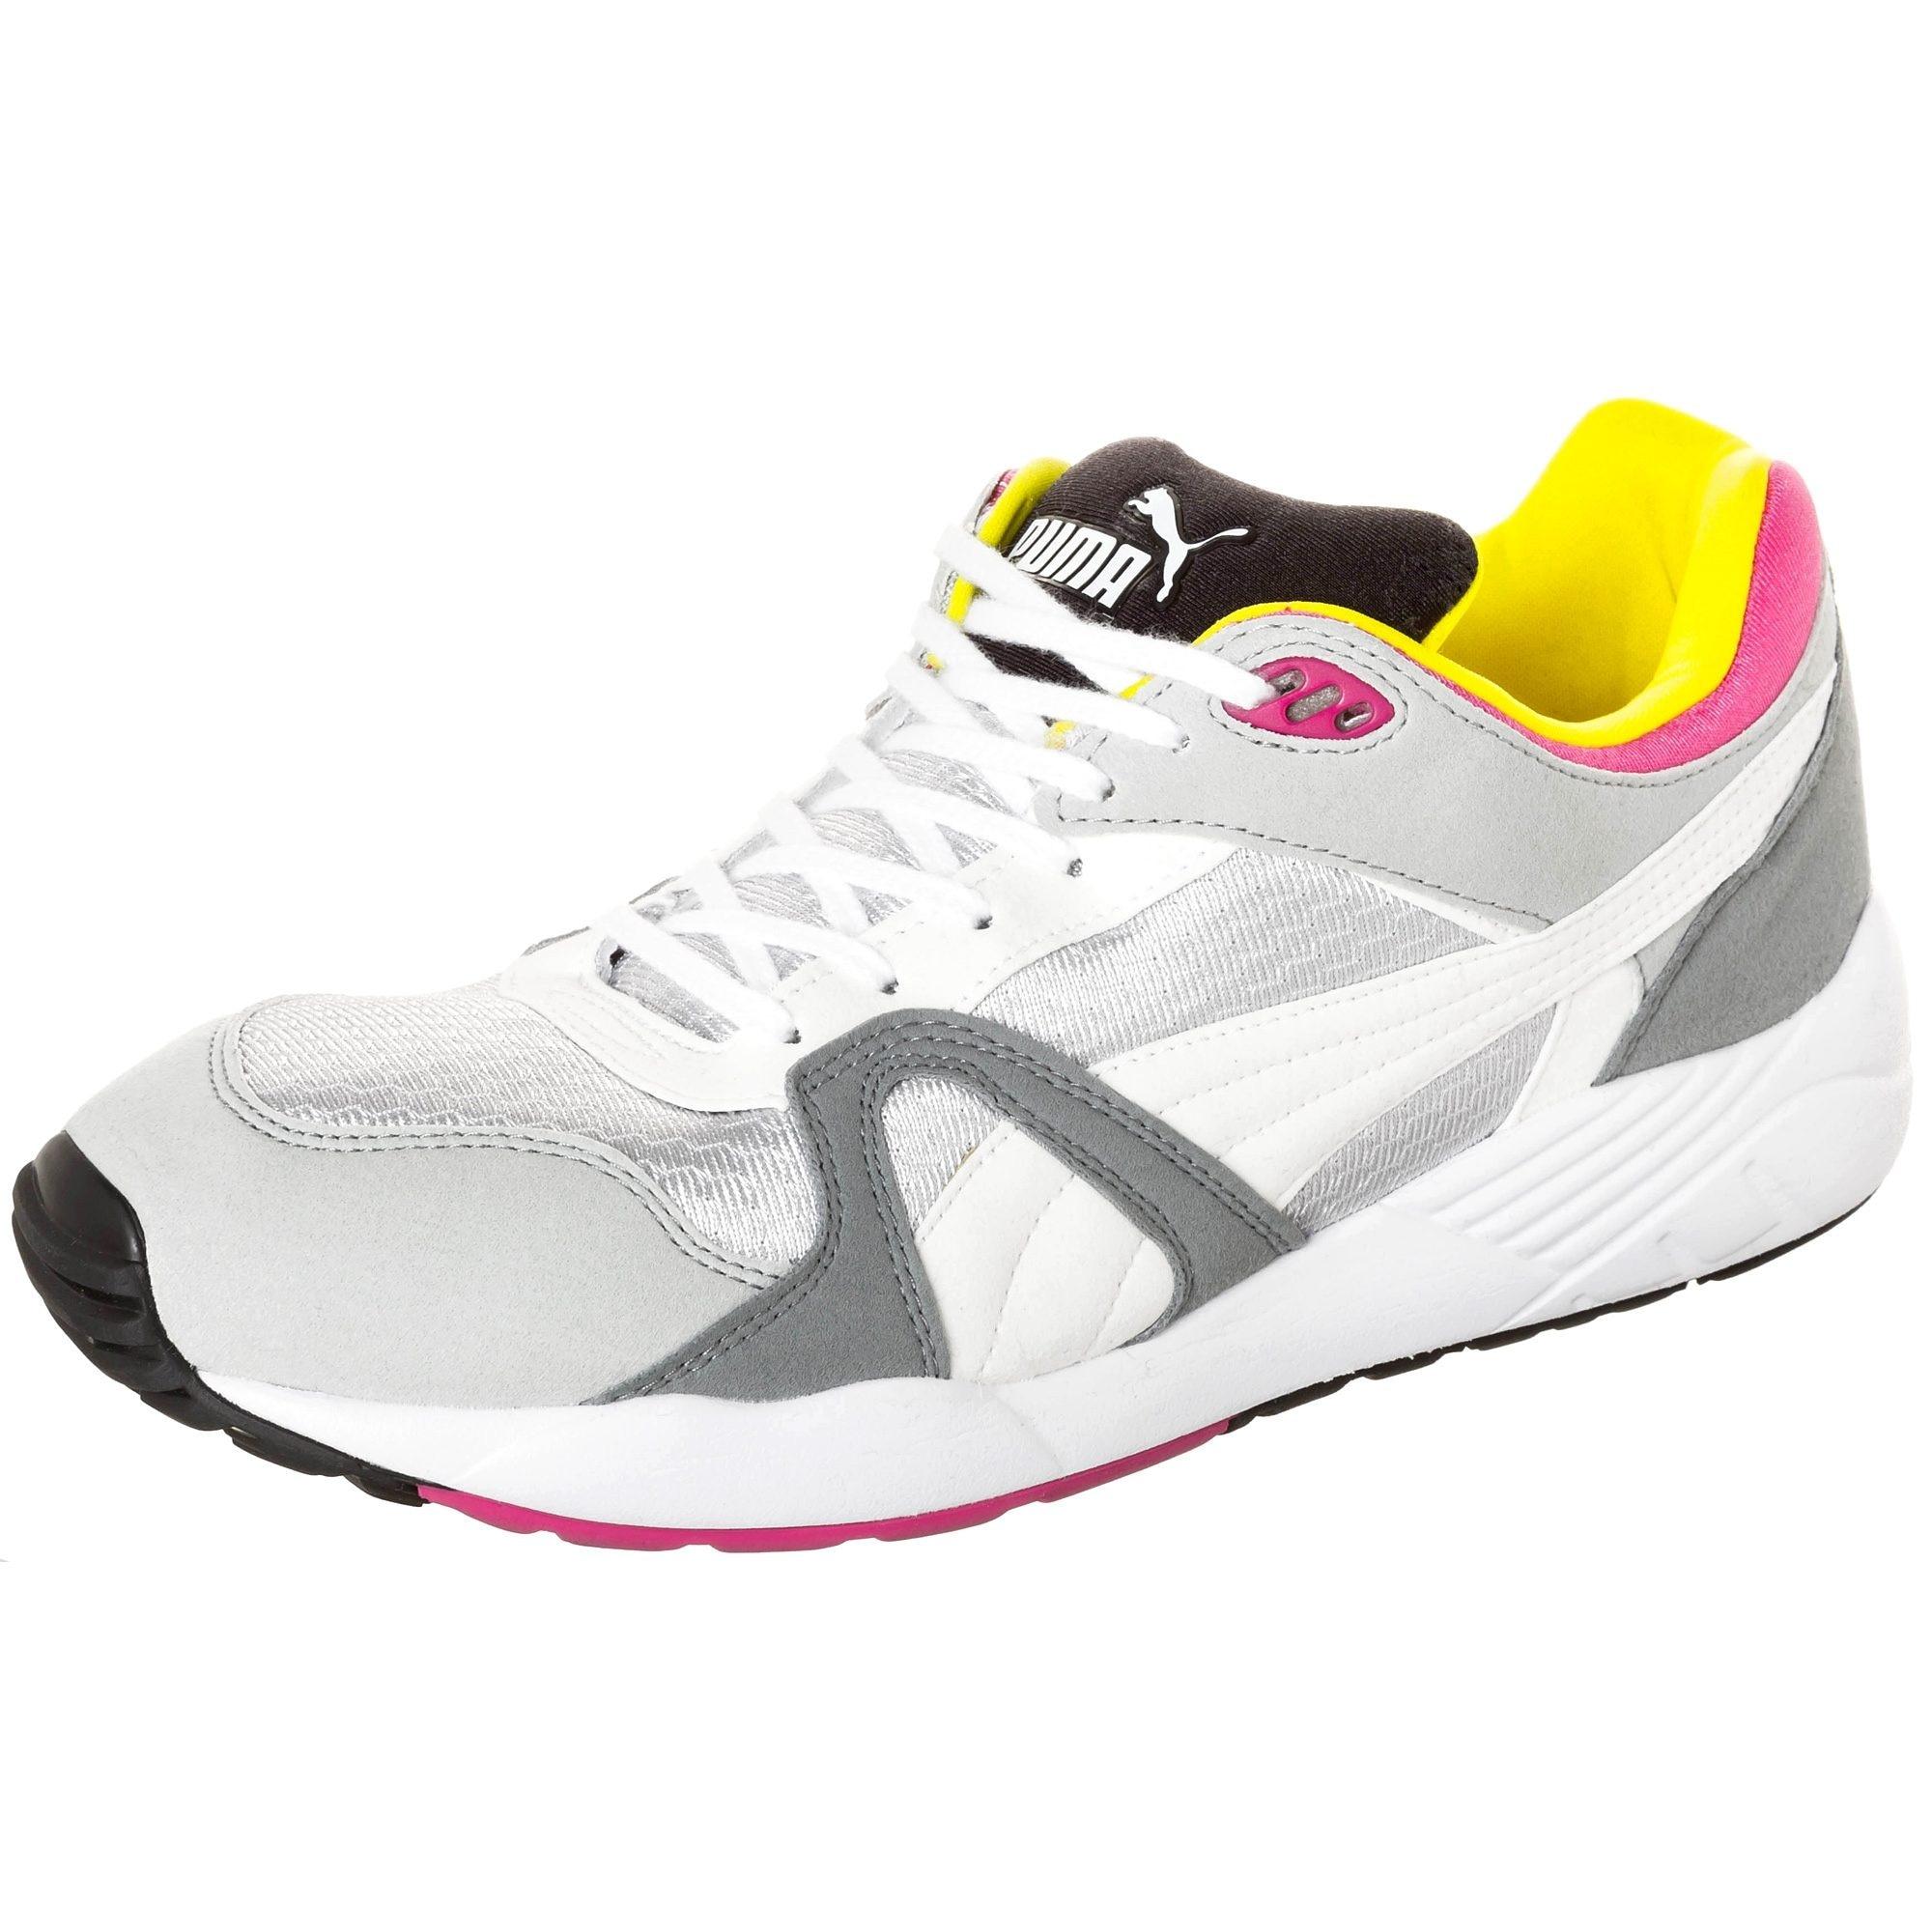 Puma Trinomic Compression Xs 500 Sneaker Herren Weiß